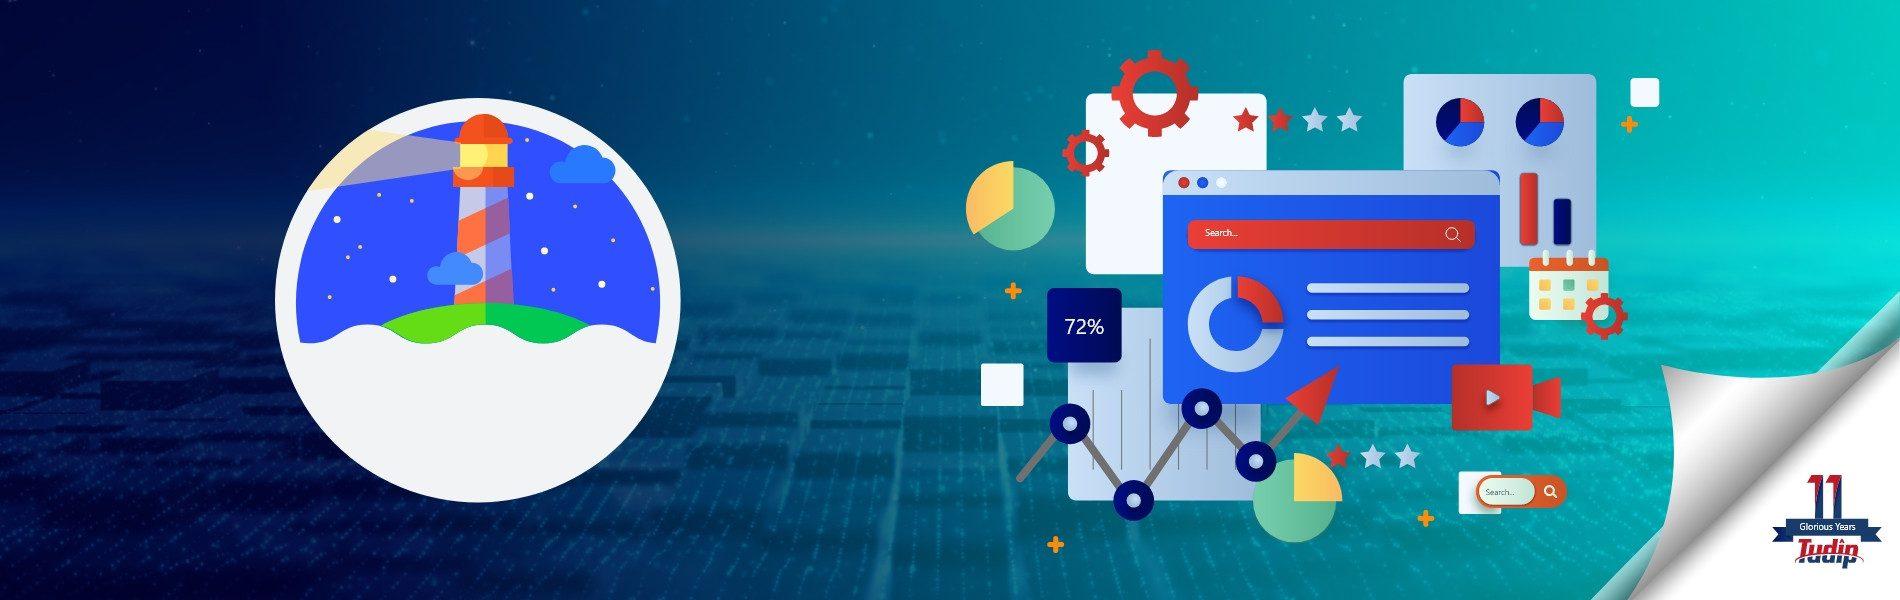 Auditing Web Application Using Google Lighthouse